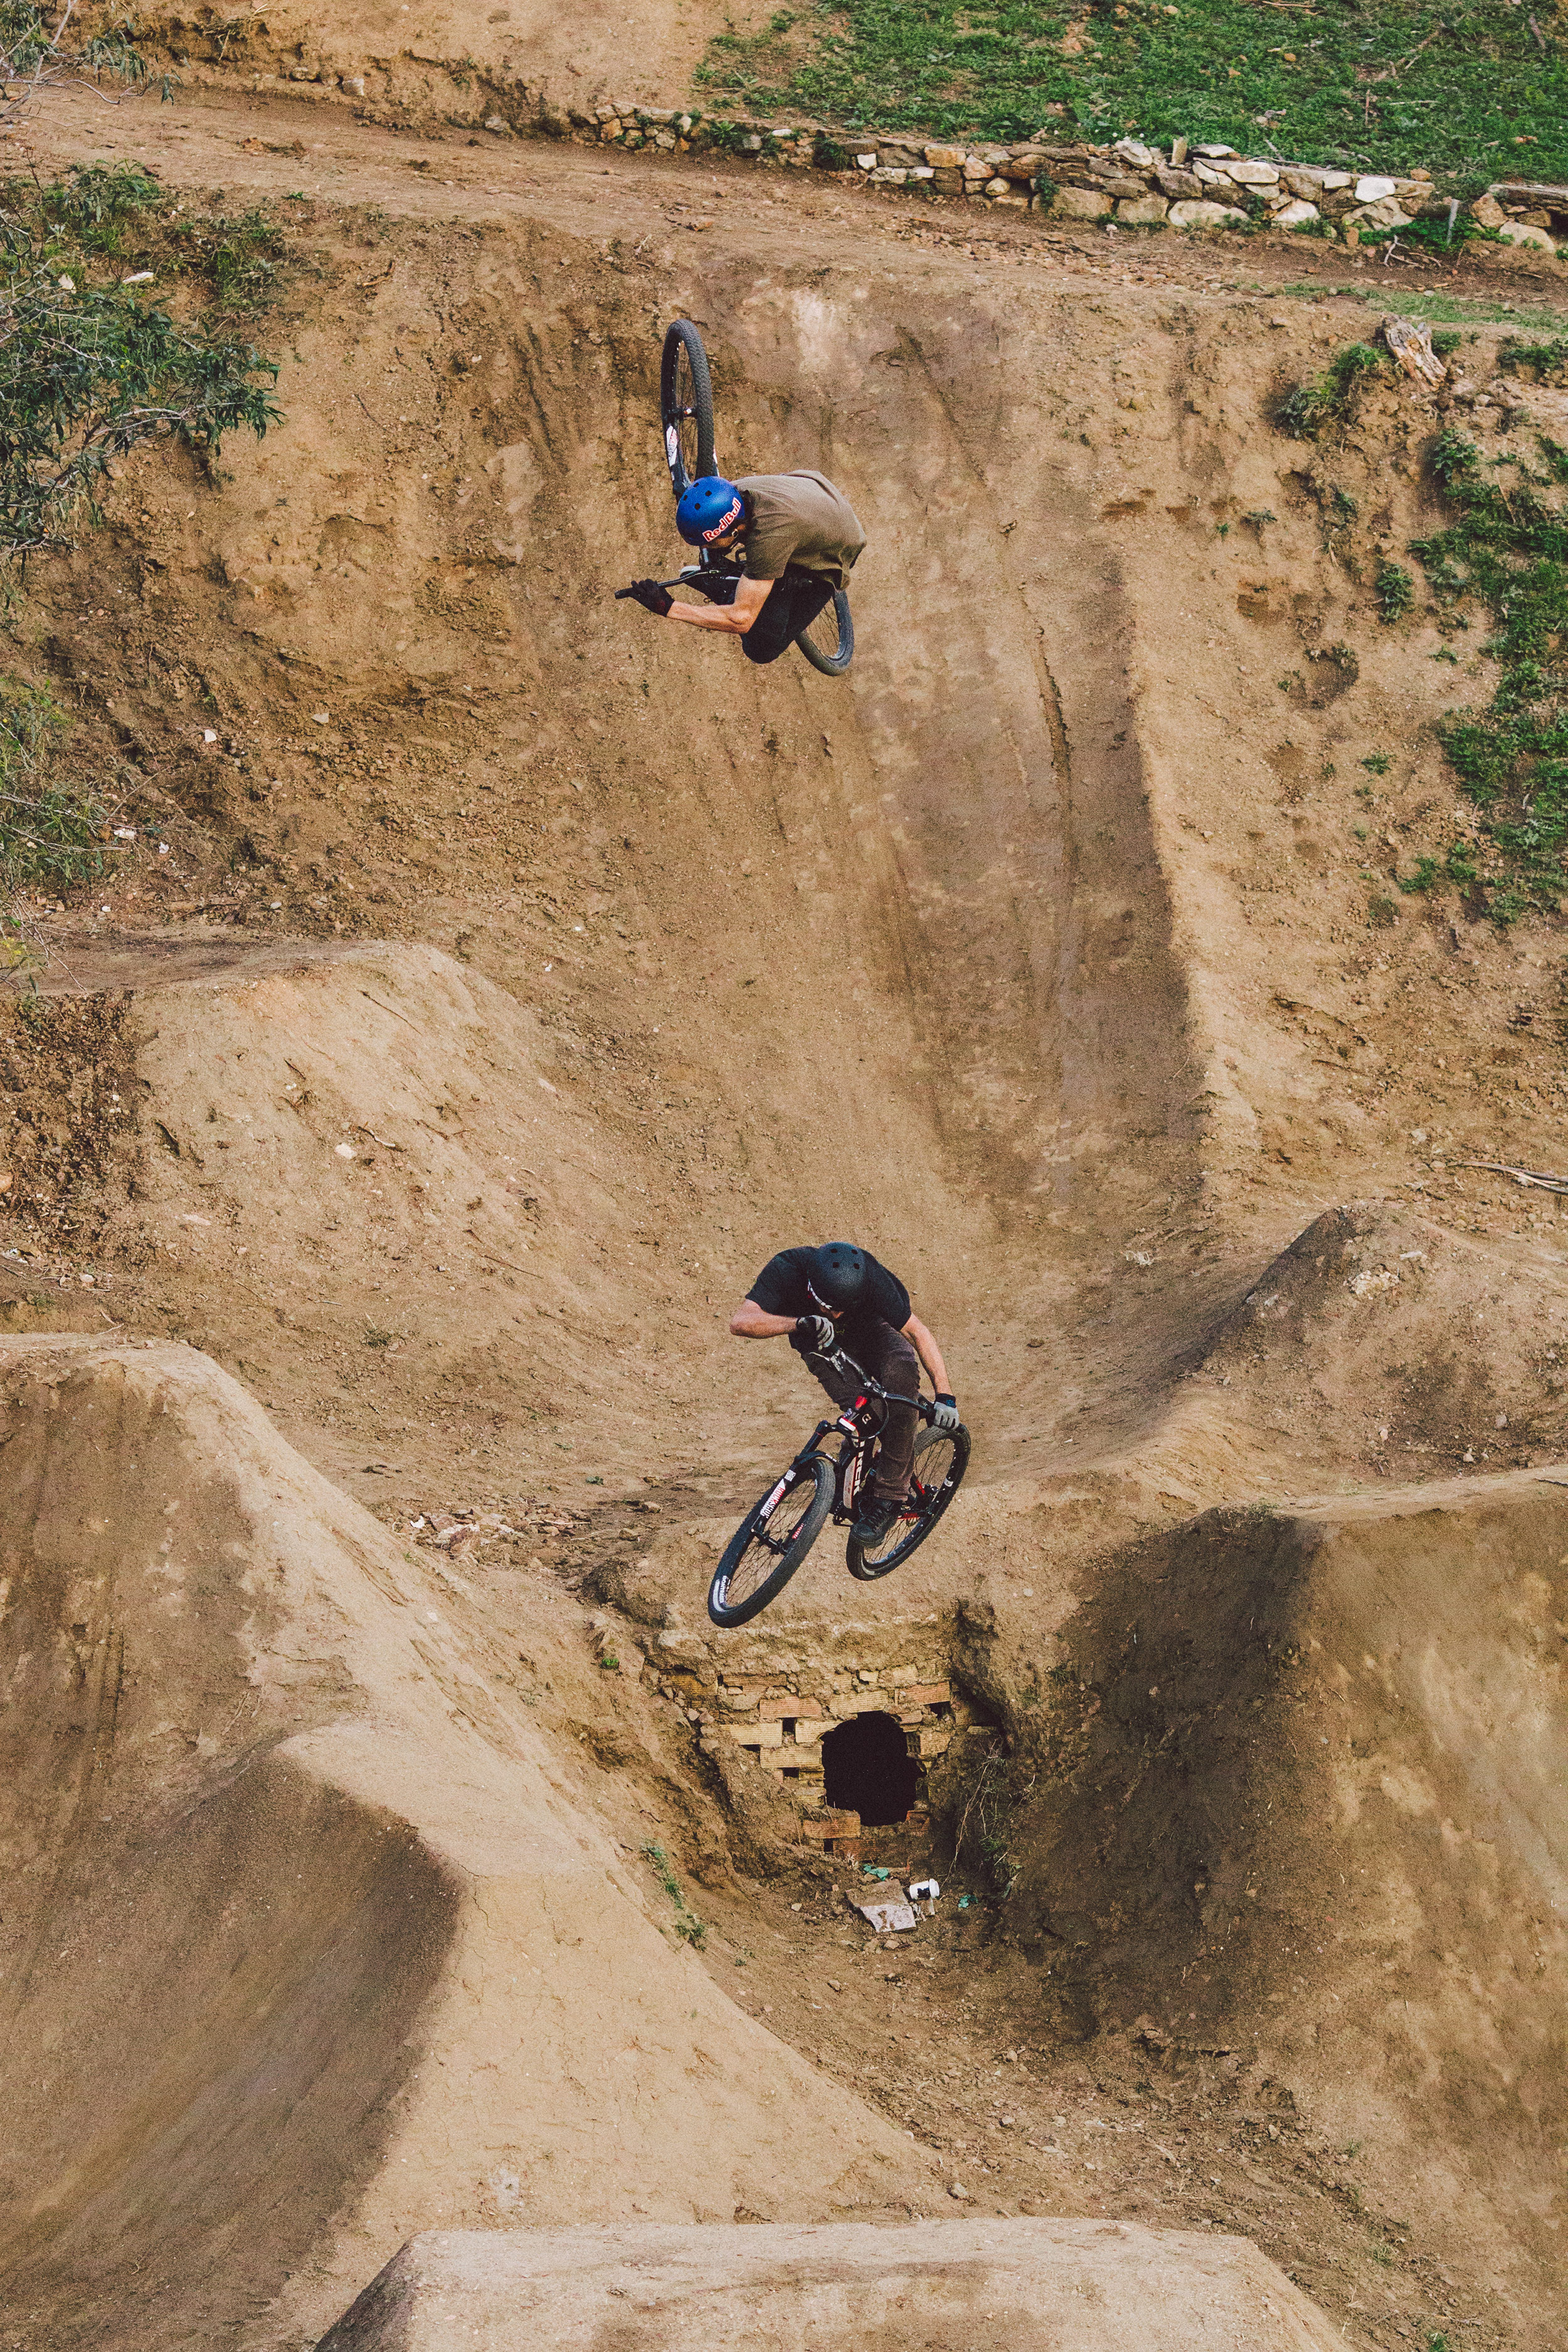 Brandon Semenuk, Ryan Howard / n2b   Mijas, Spain